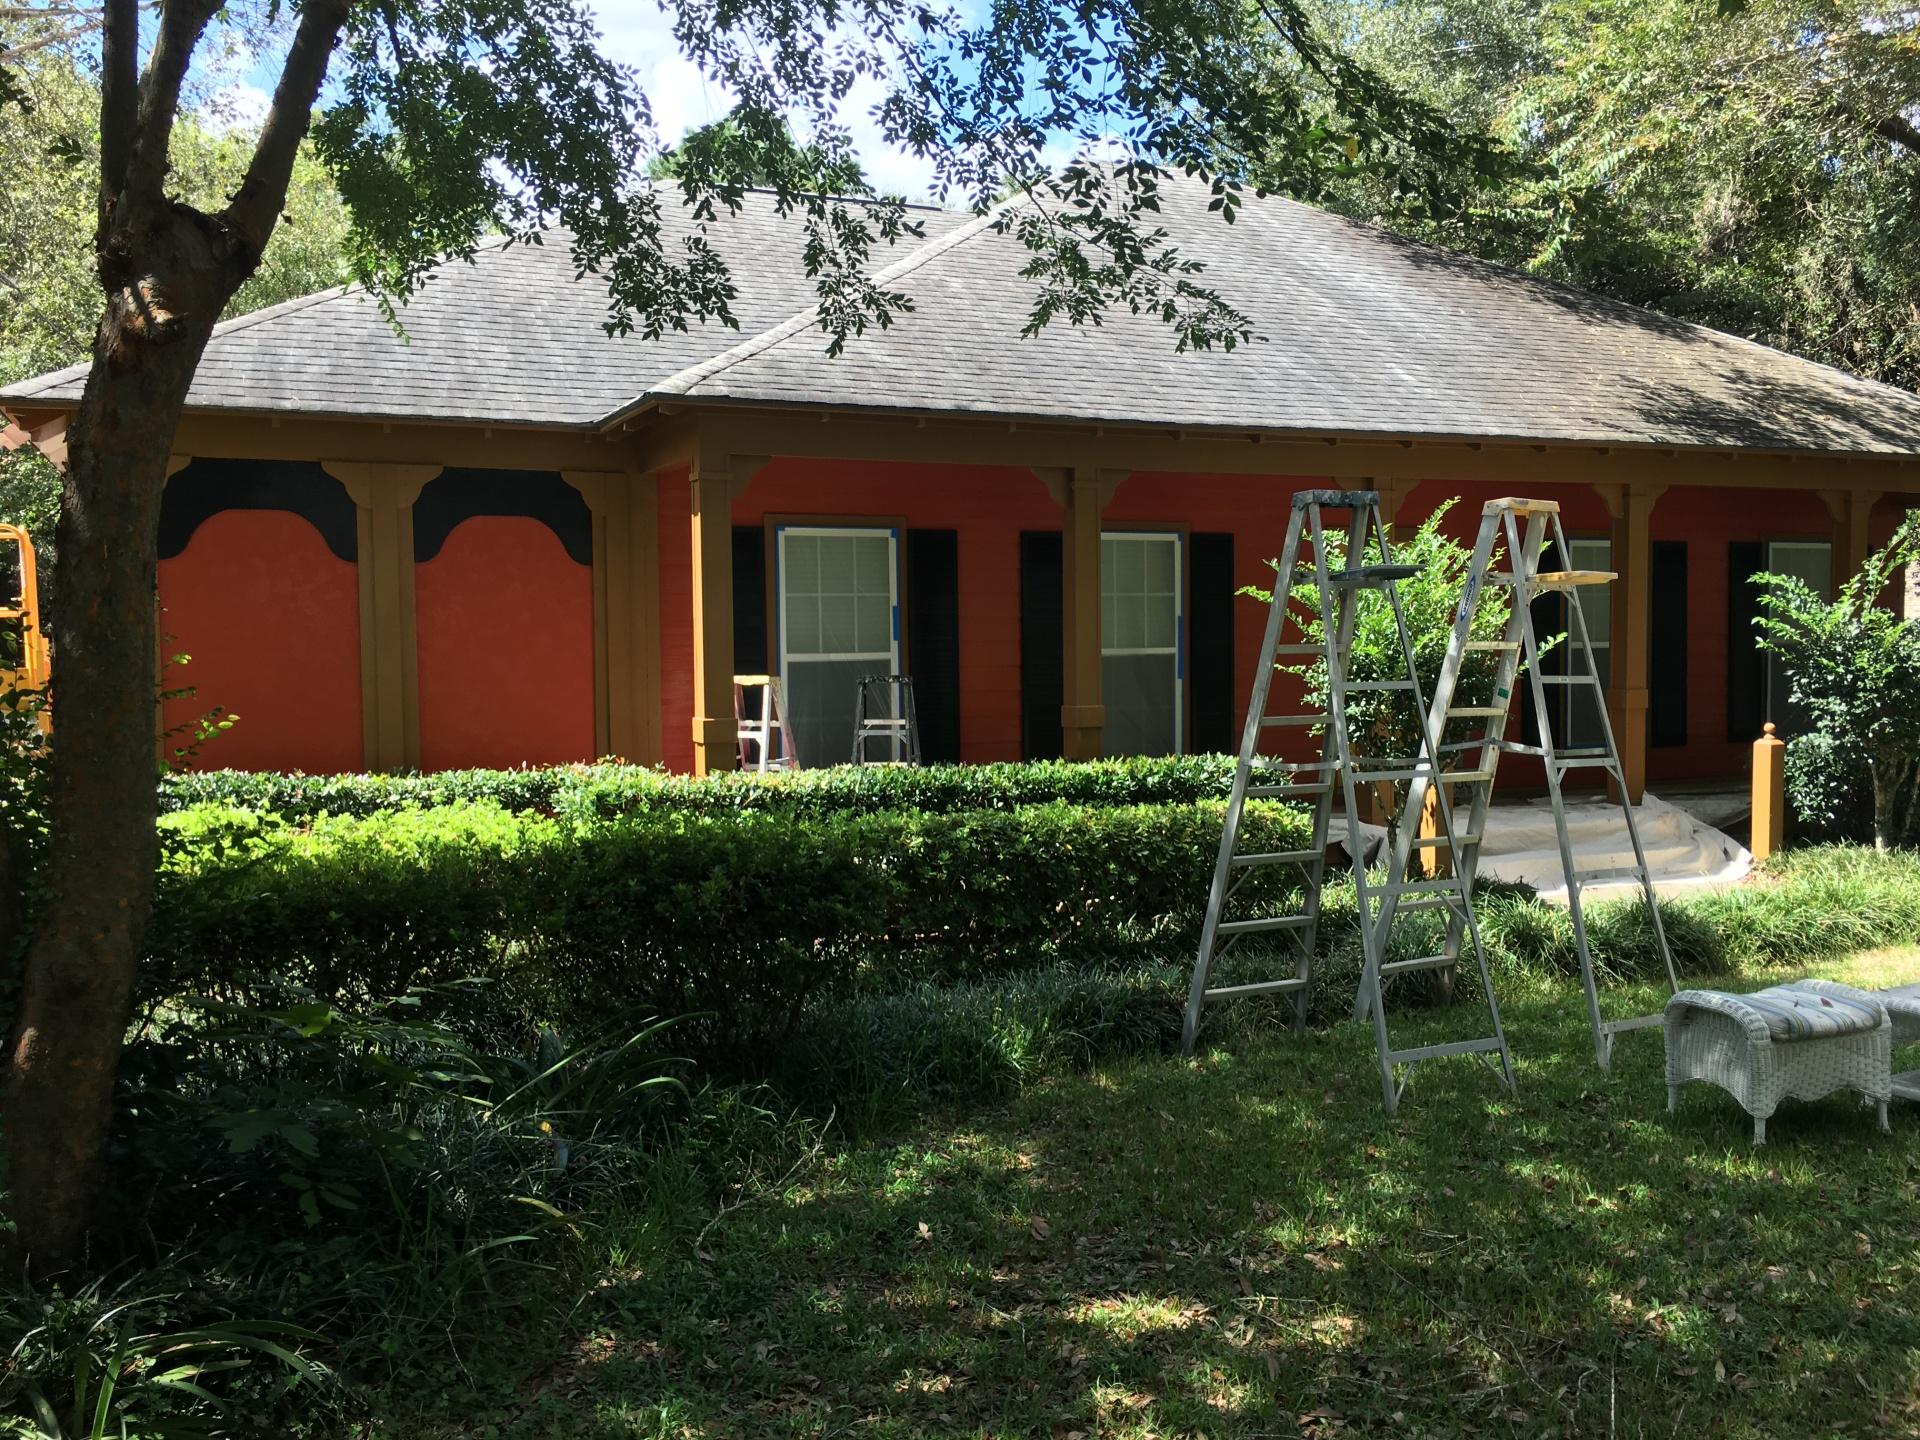 Light Blue Painted Home - Magnolia Springs AL